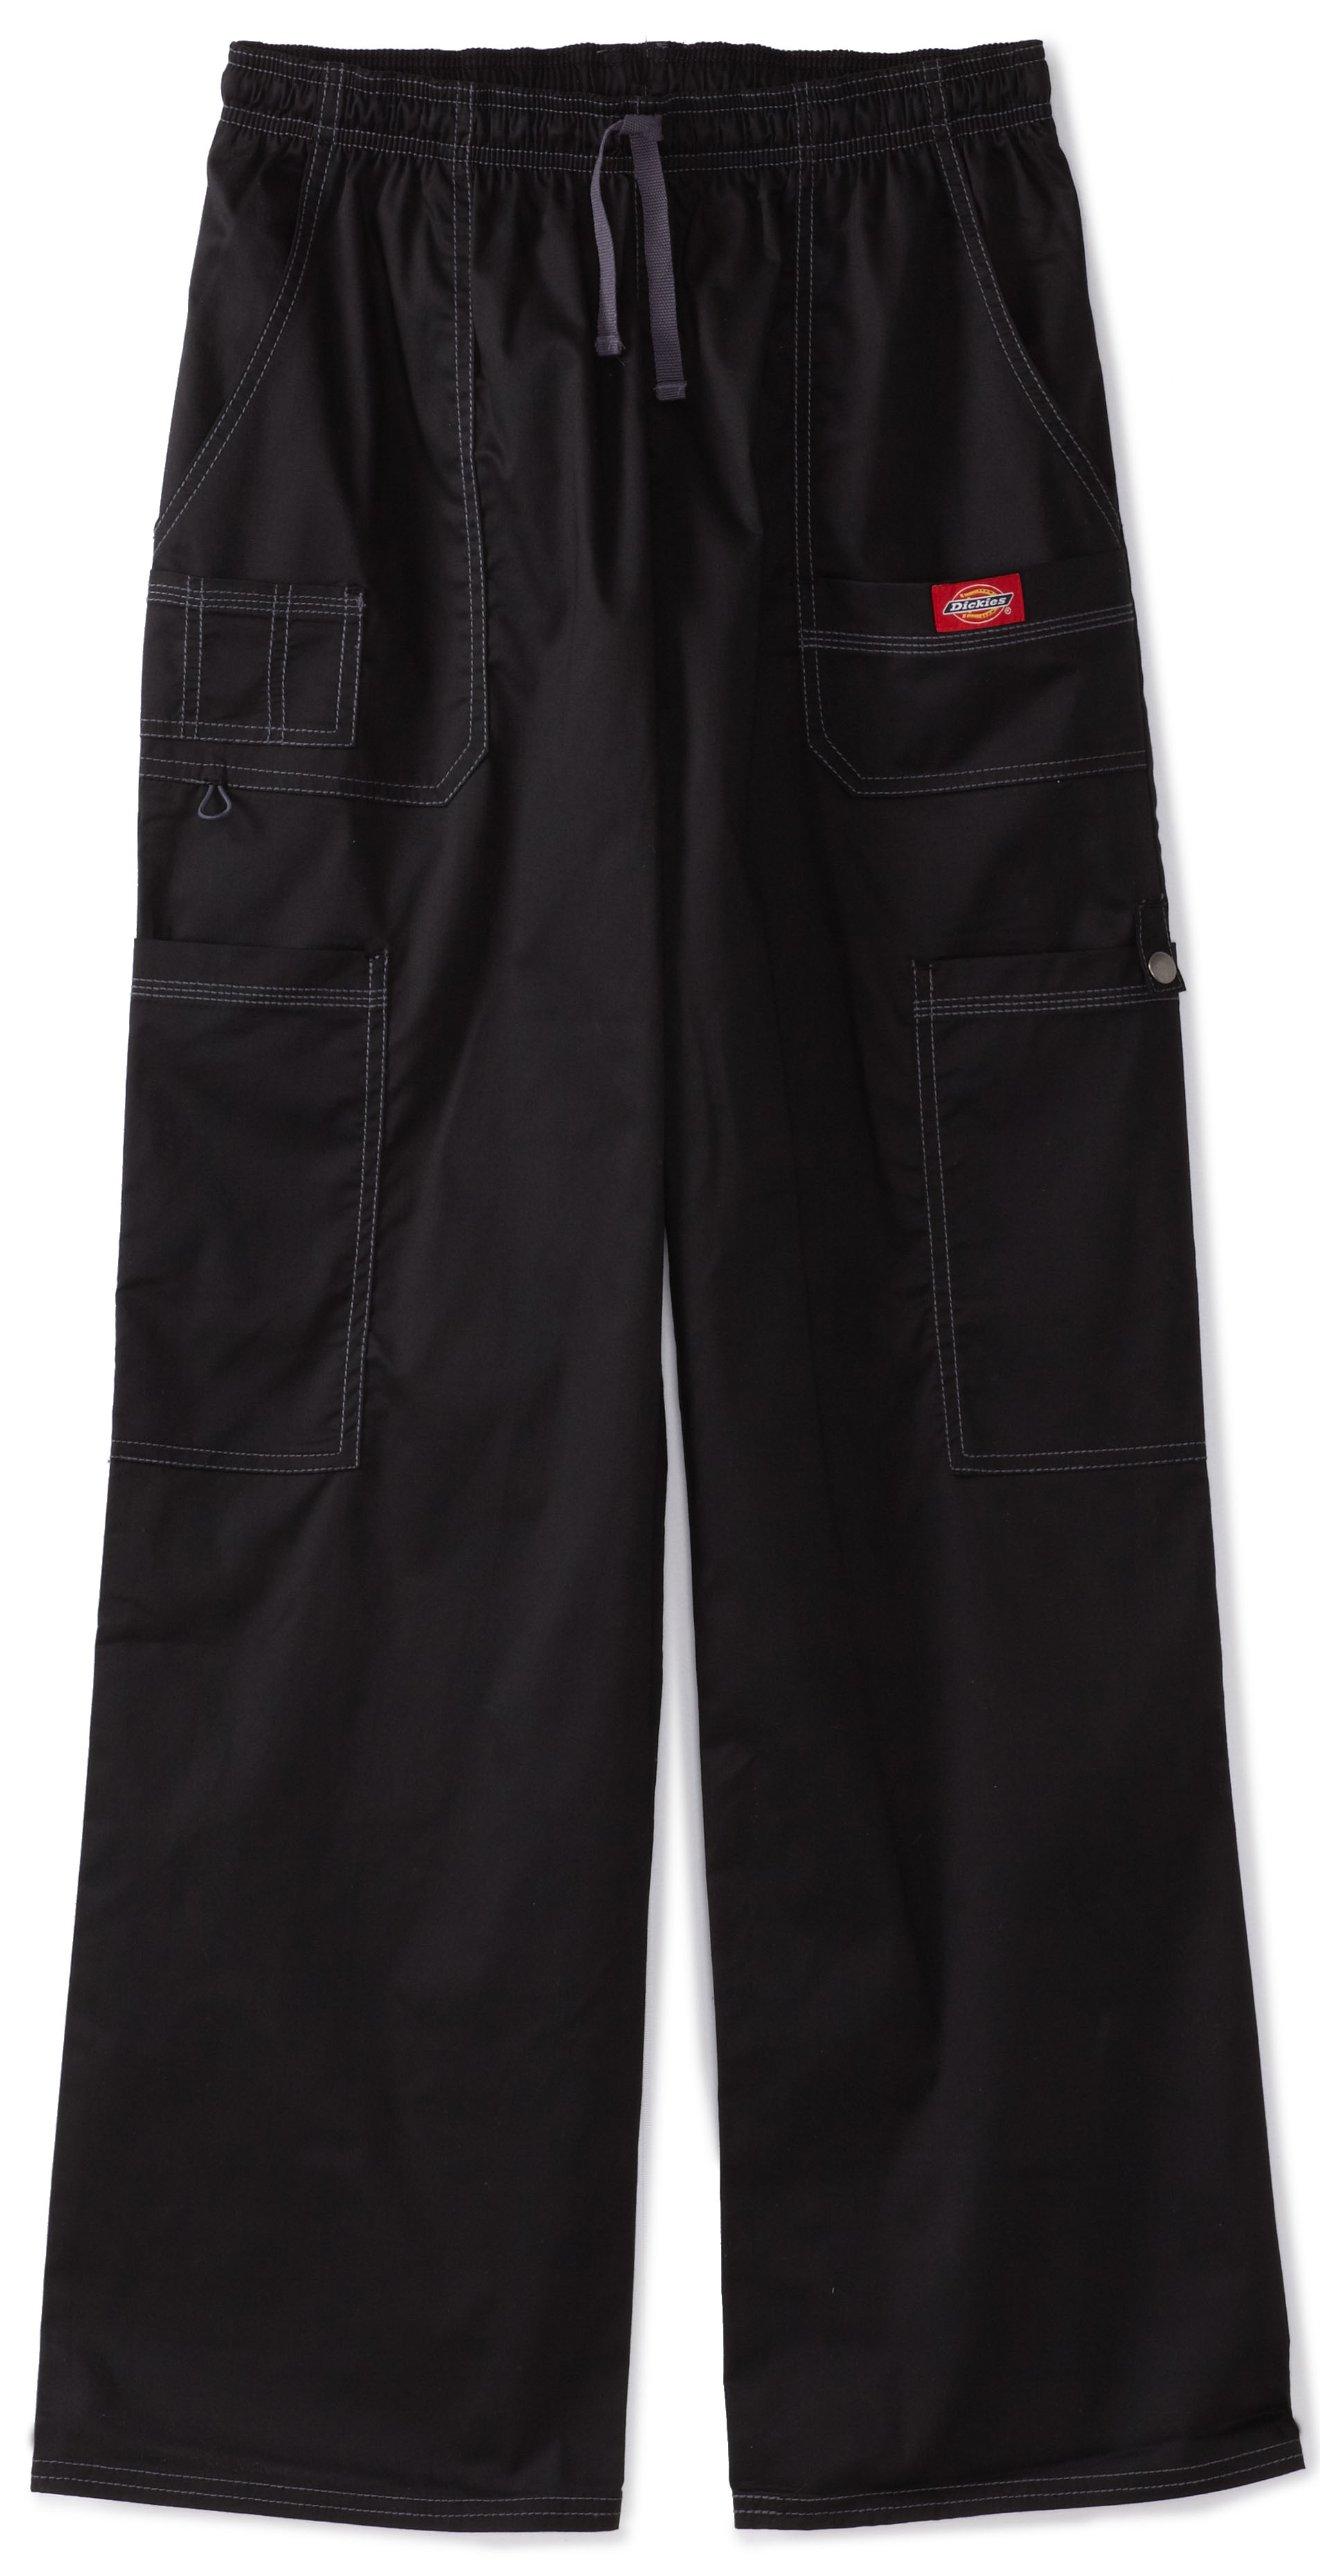 Dickies Generation Flex Men's Youtility Scrub Pants,Black,Medium